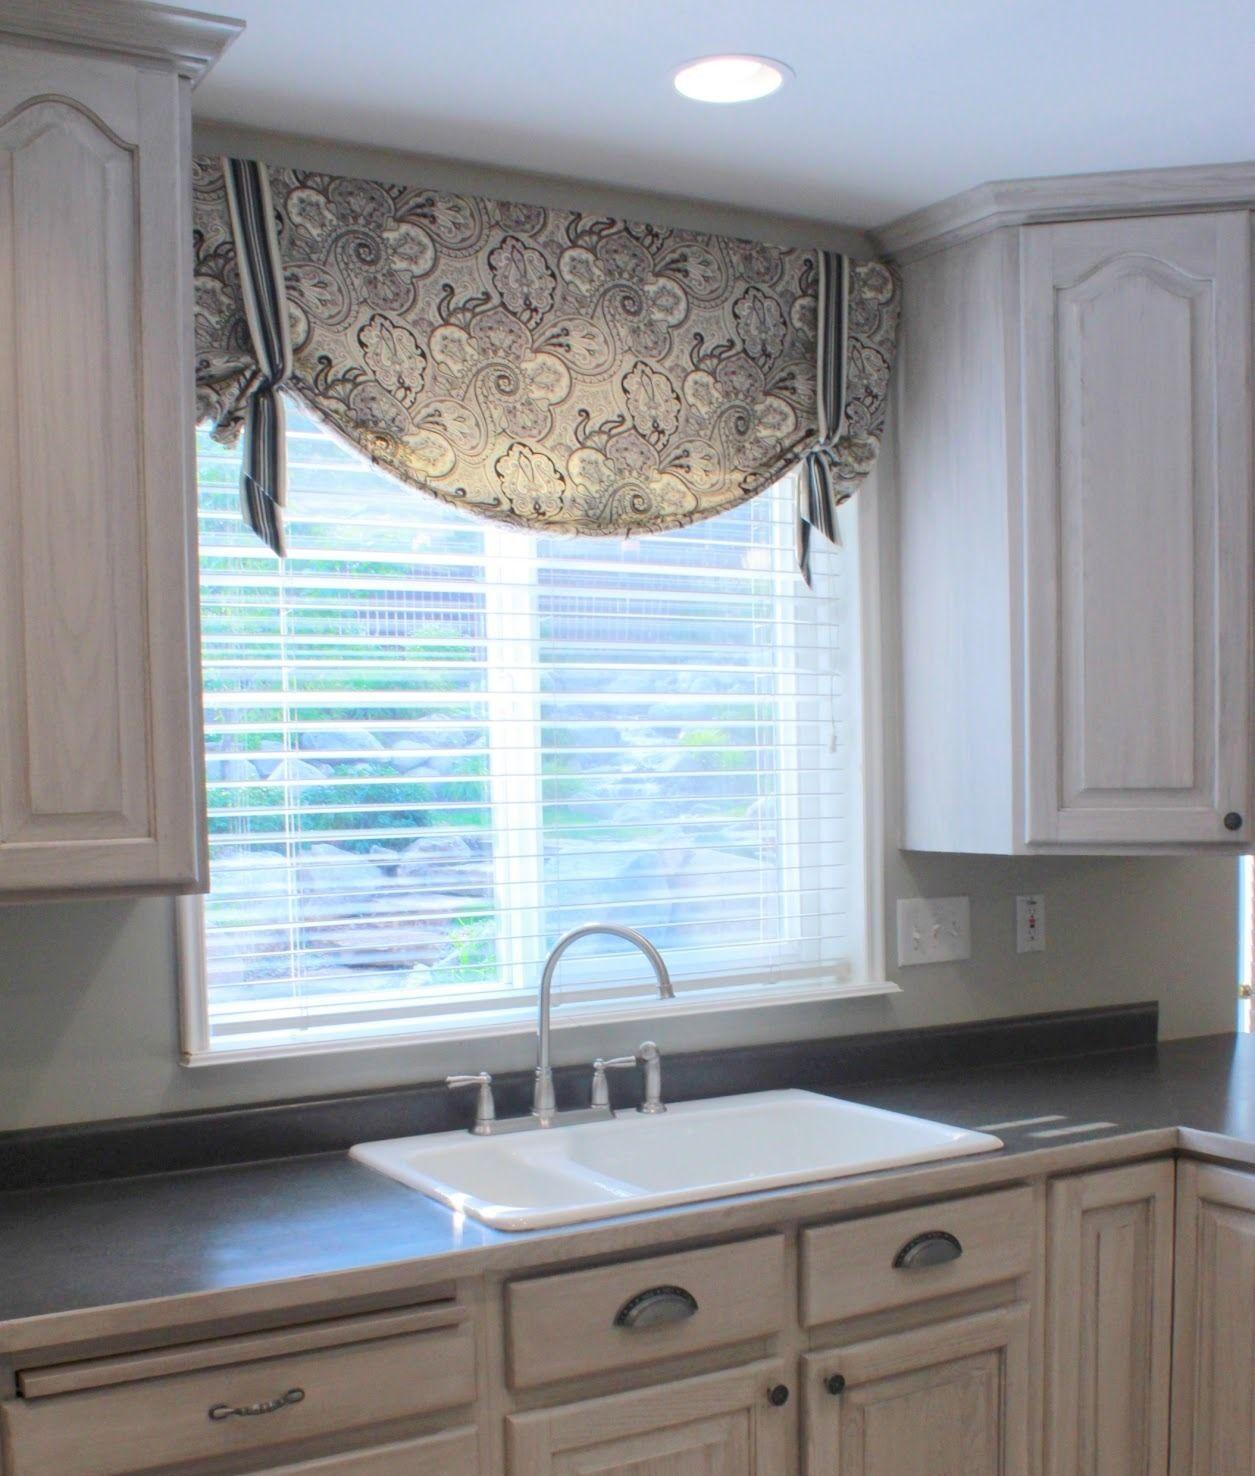 Kitchen window treatment ideas  kitchen window treatments  window treatments for kitchen